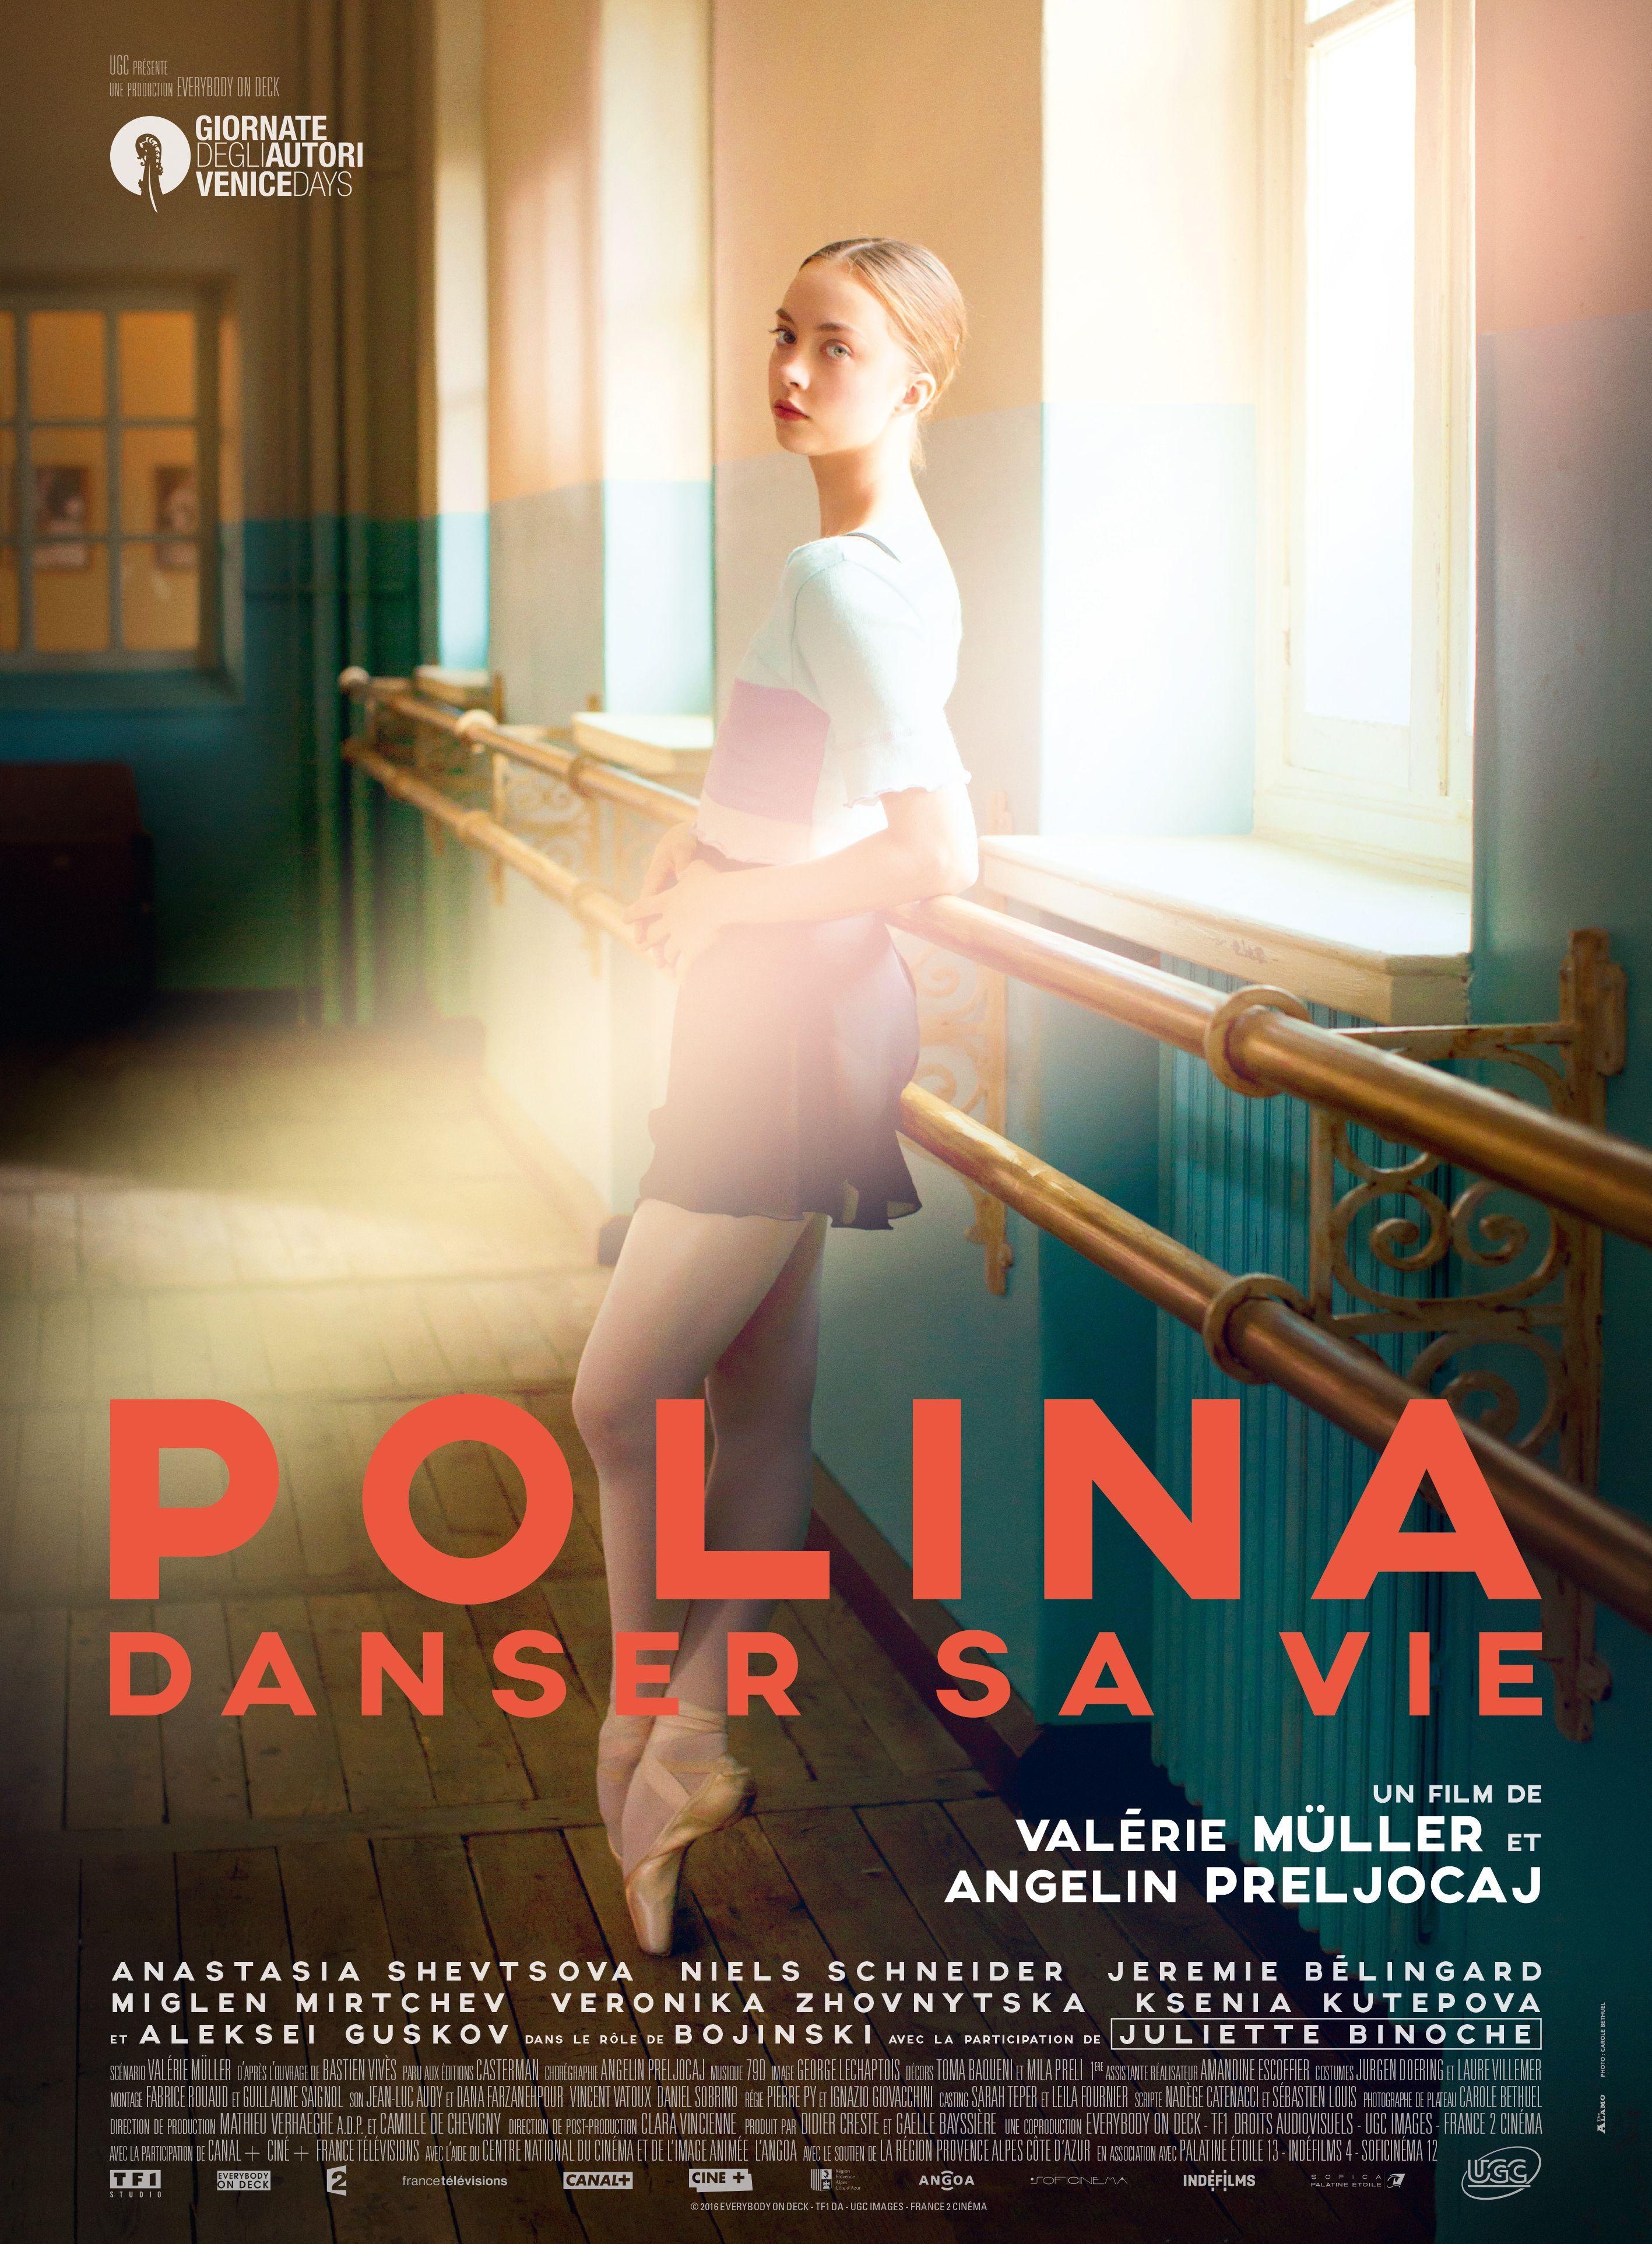 Polina, danser sa vie - Film (2016)